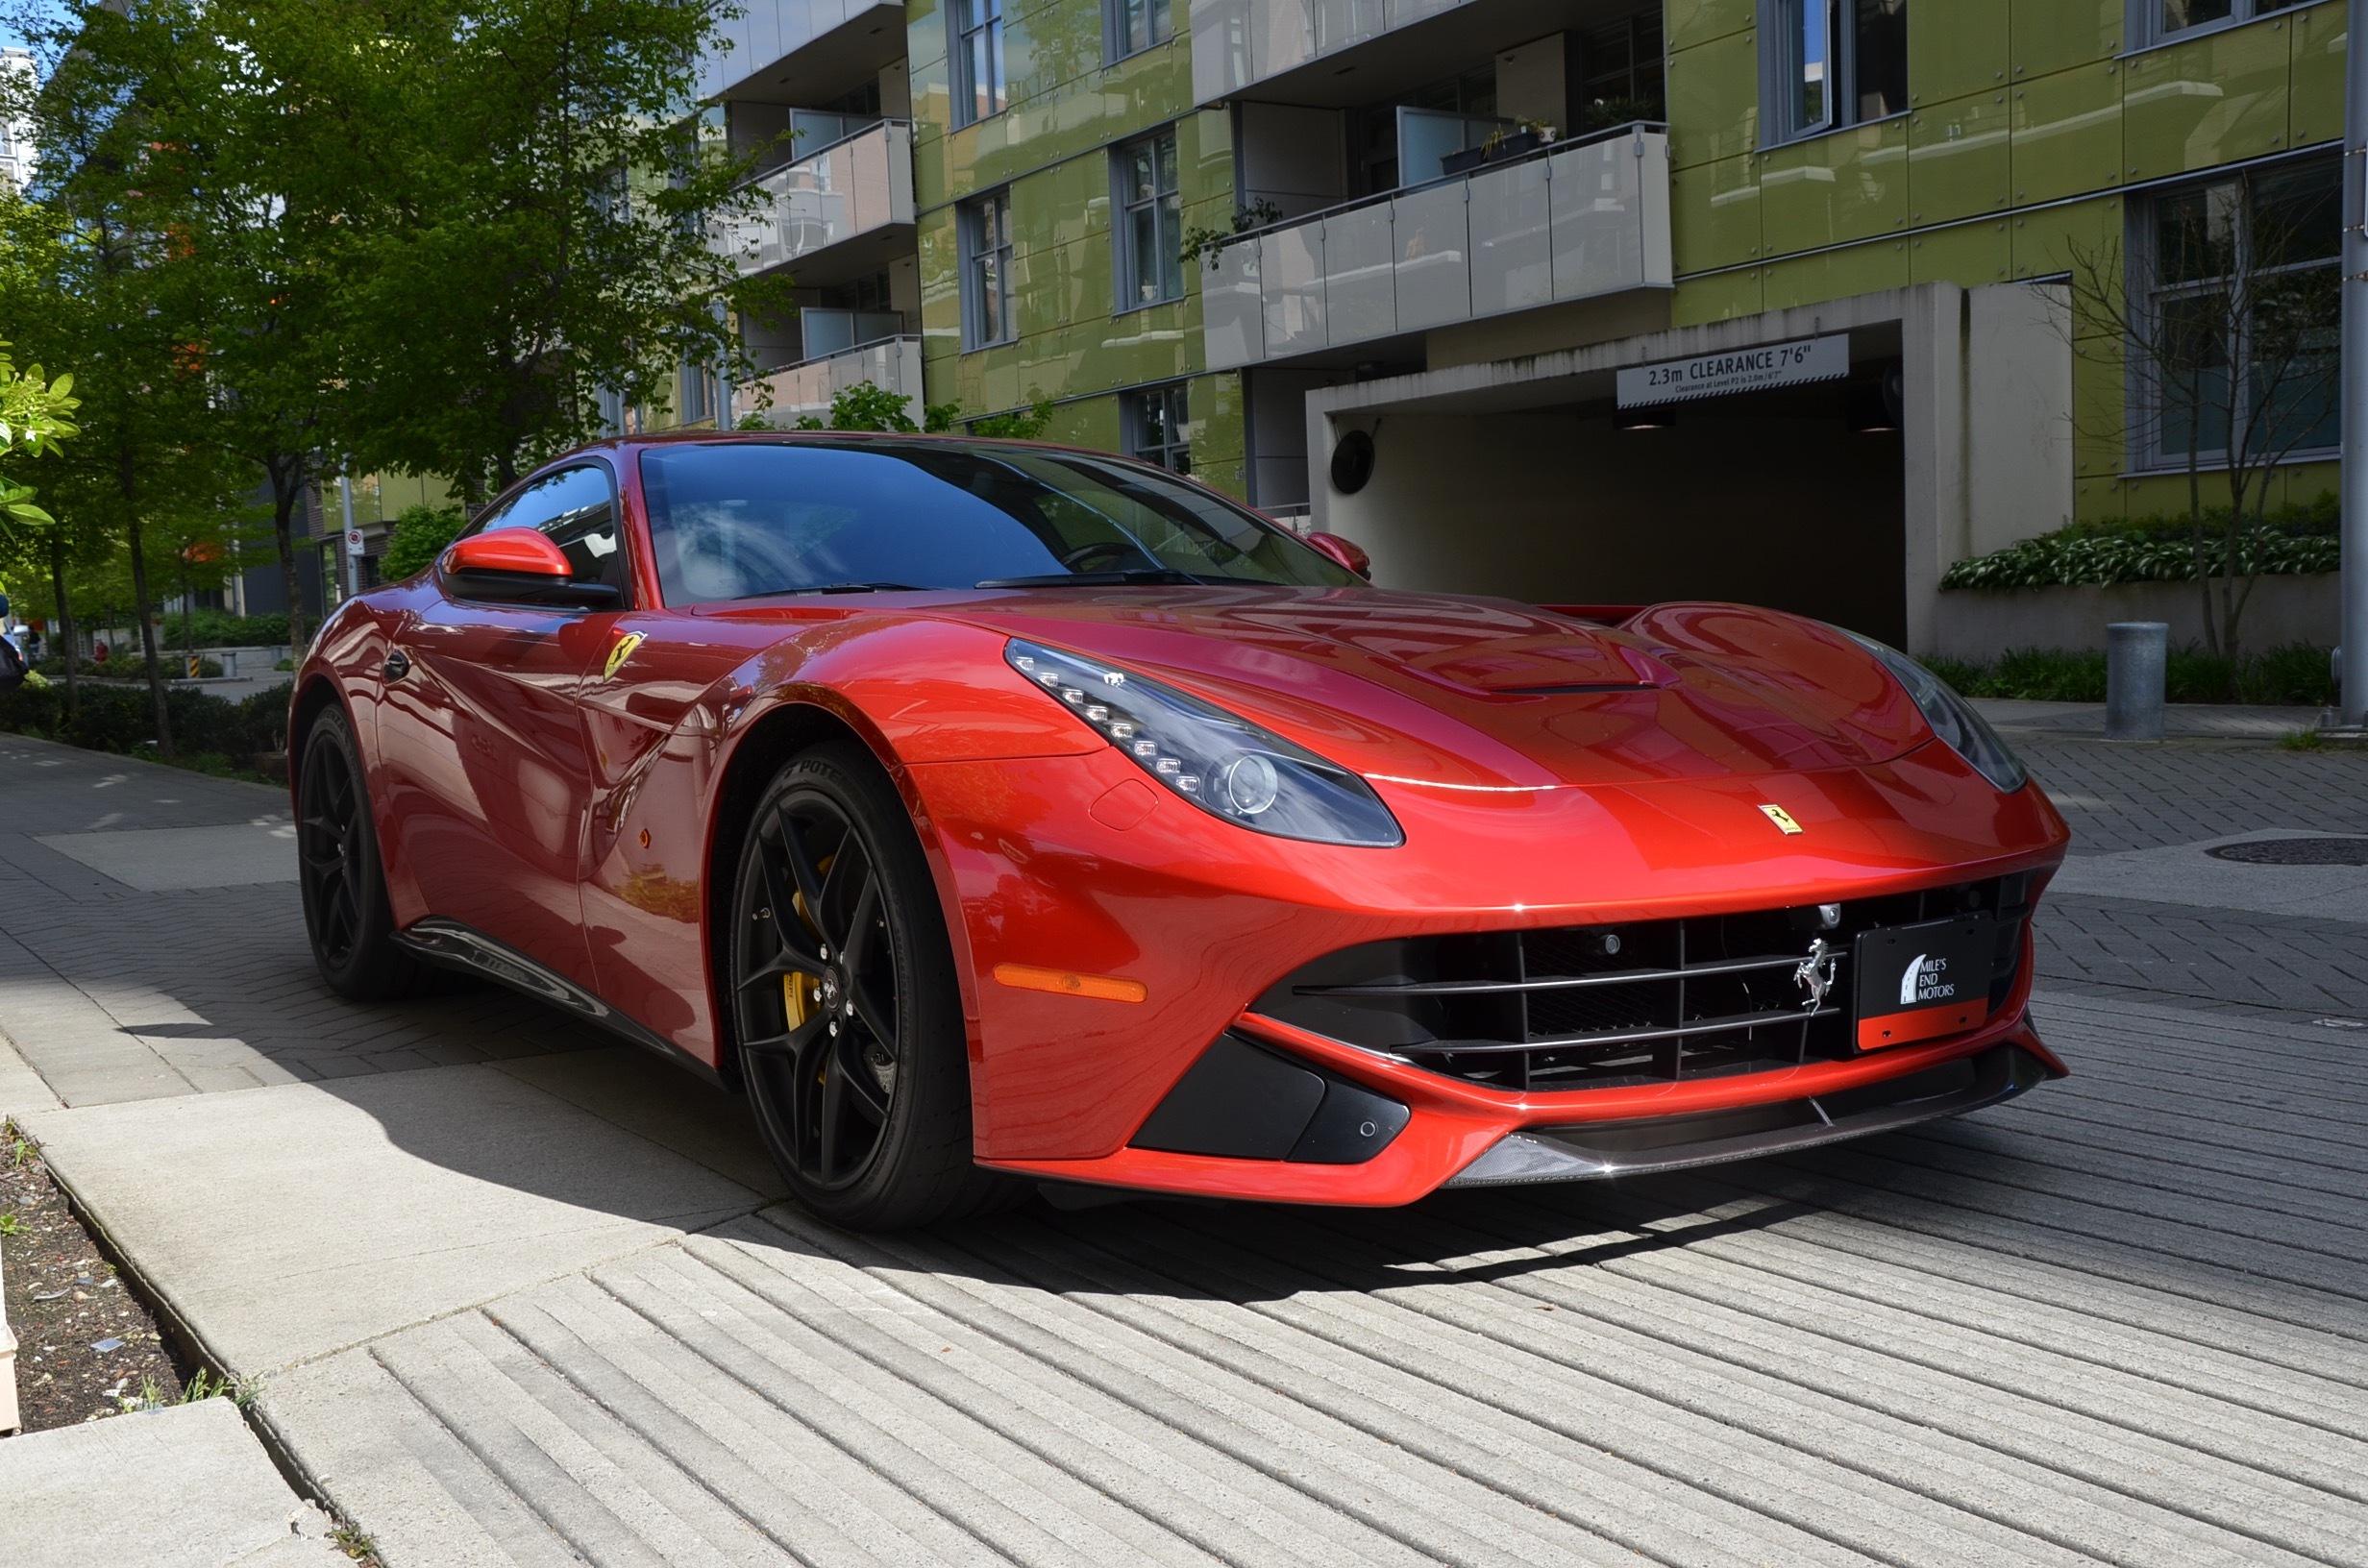 Ferrari F12 Price >> 2015 ferrari f12 berlinetta fuel type   Buy Aircrafts